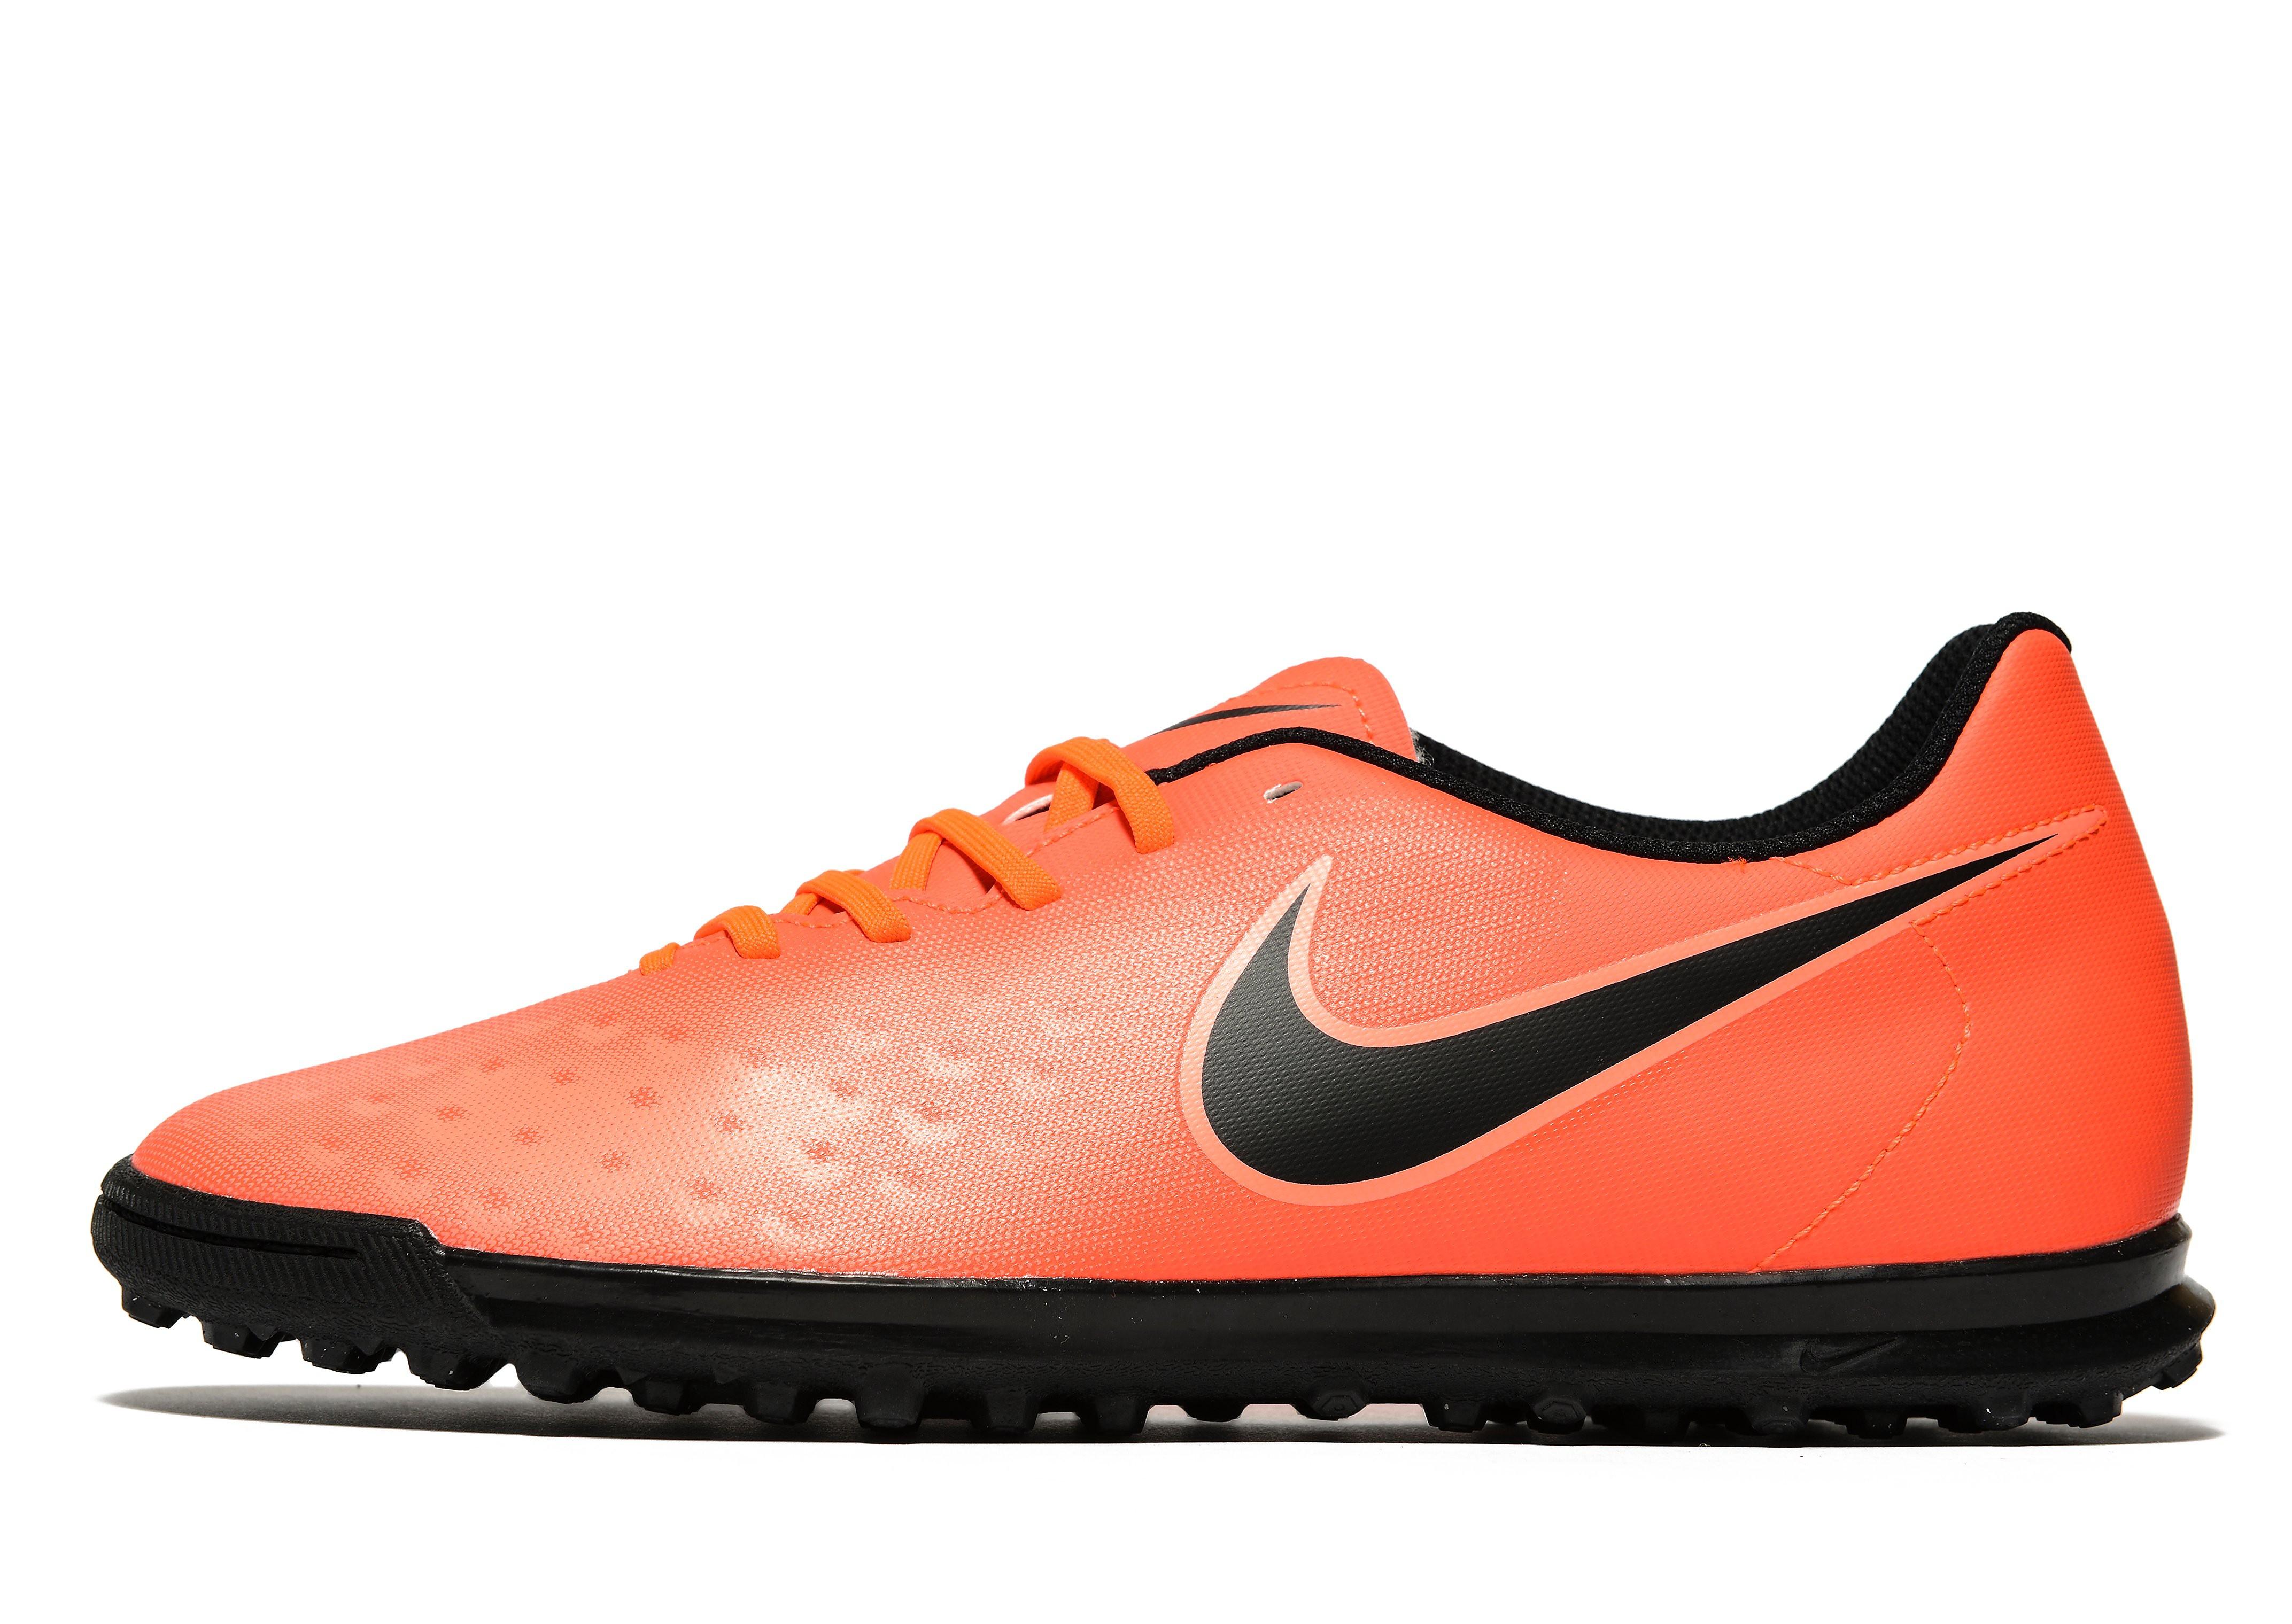 Nike Radiation Flare Magista Ola II Turf